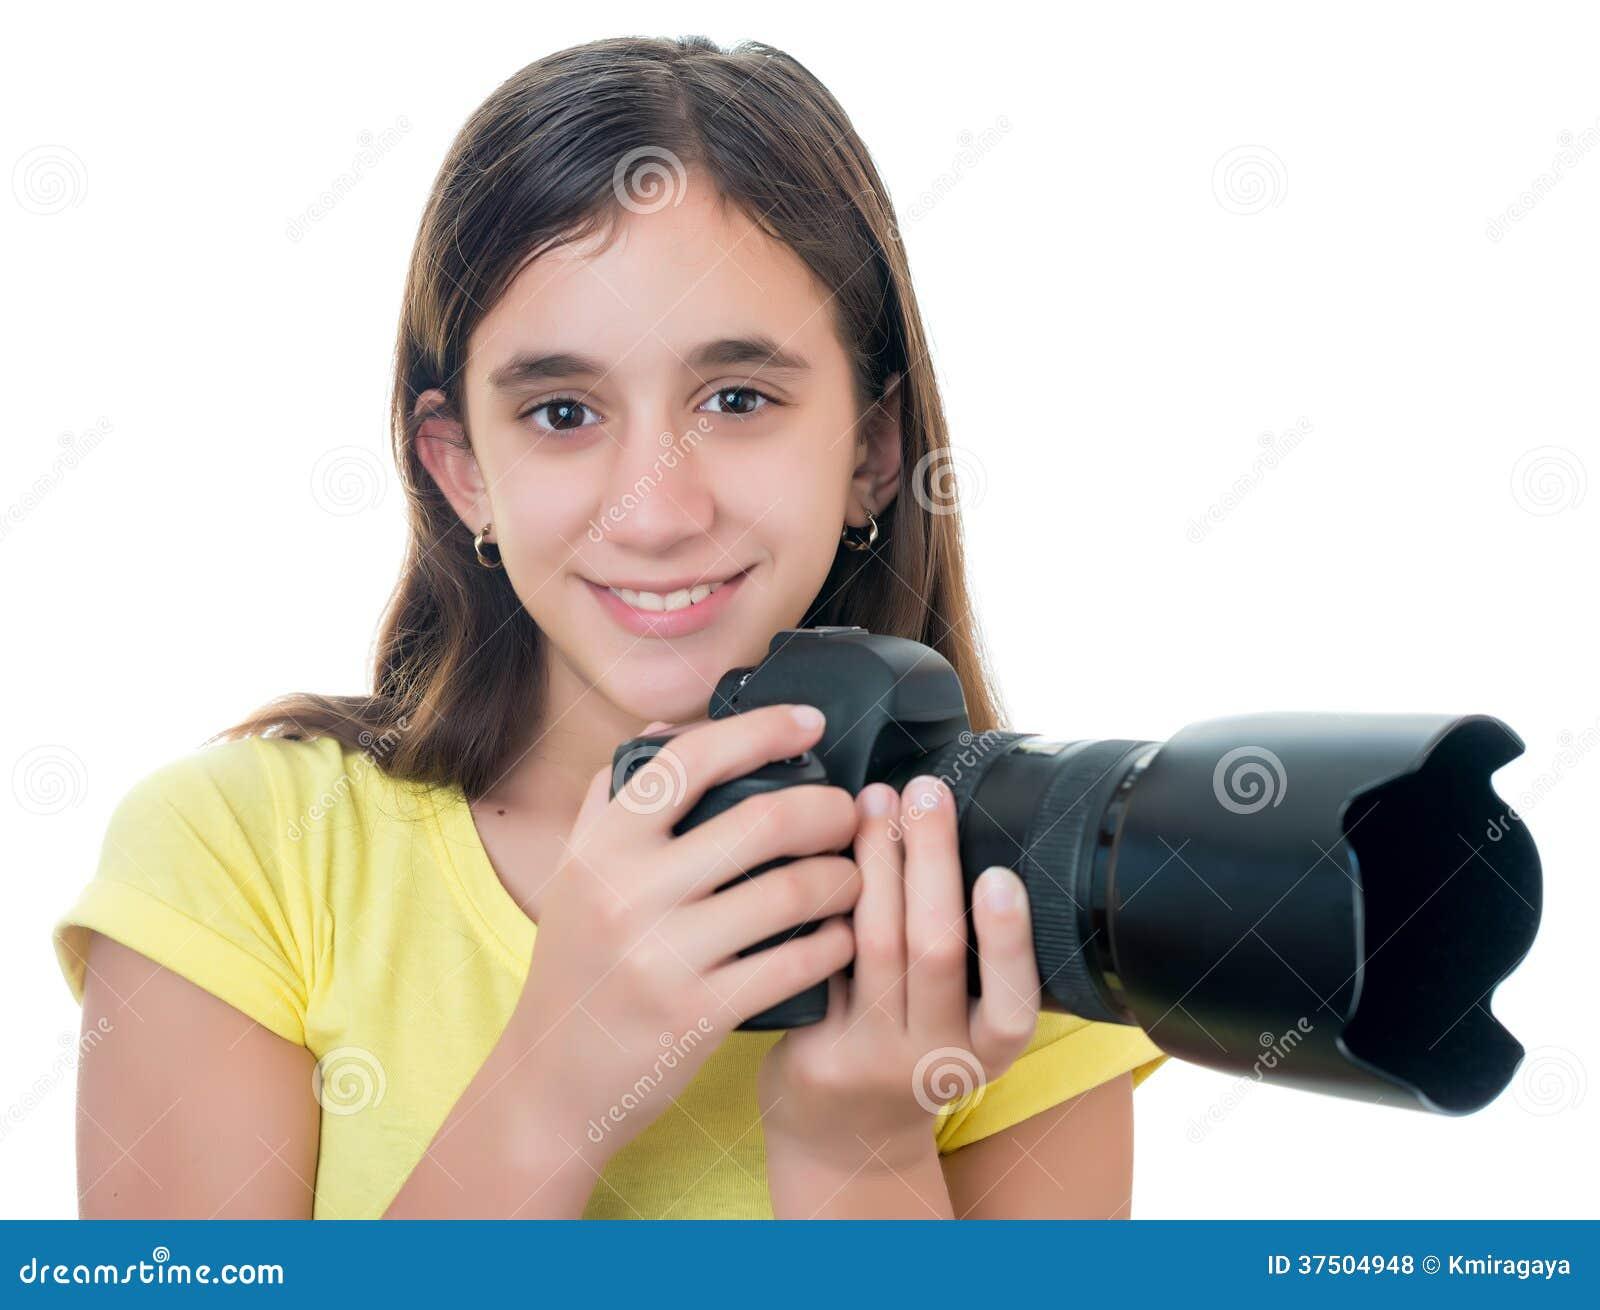 camera professional female escorts